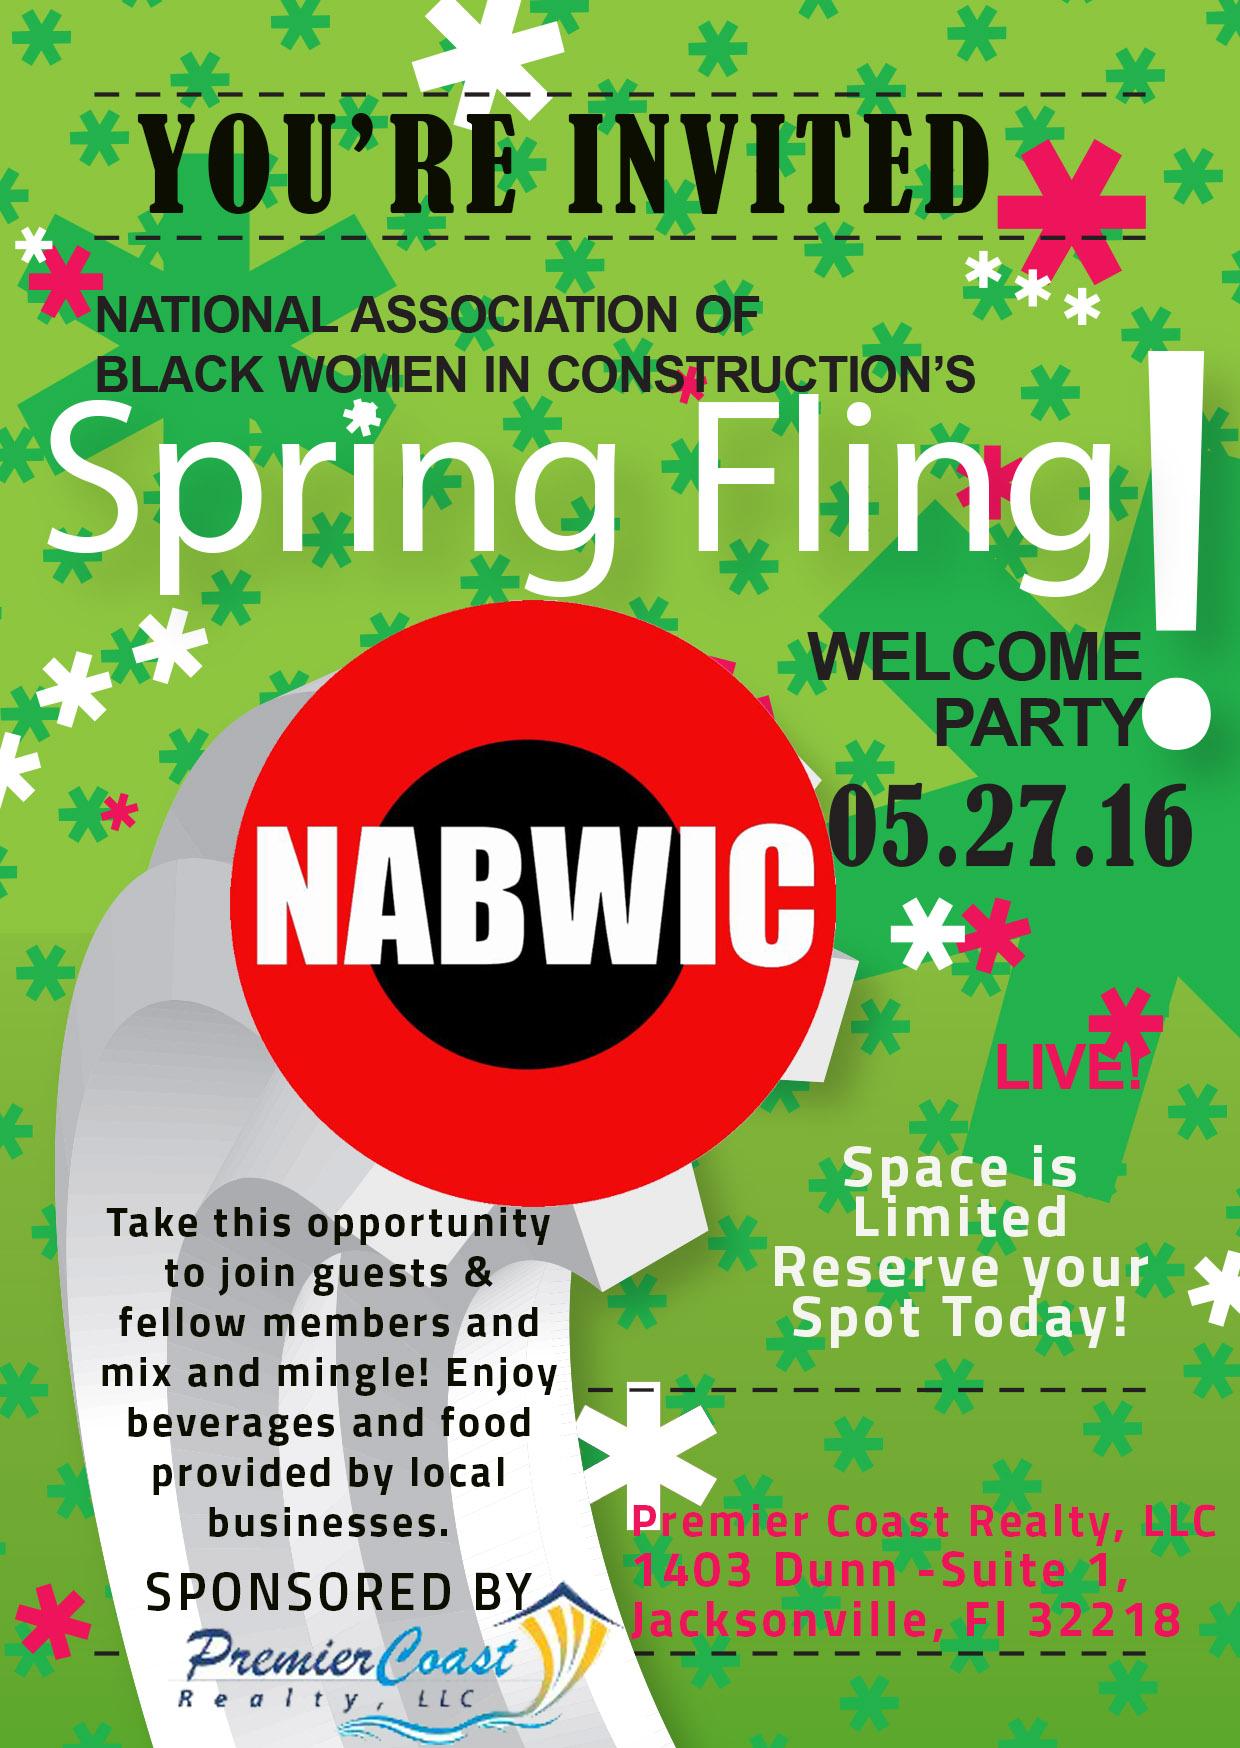 NABWIC Spring Fling